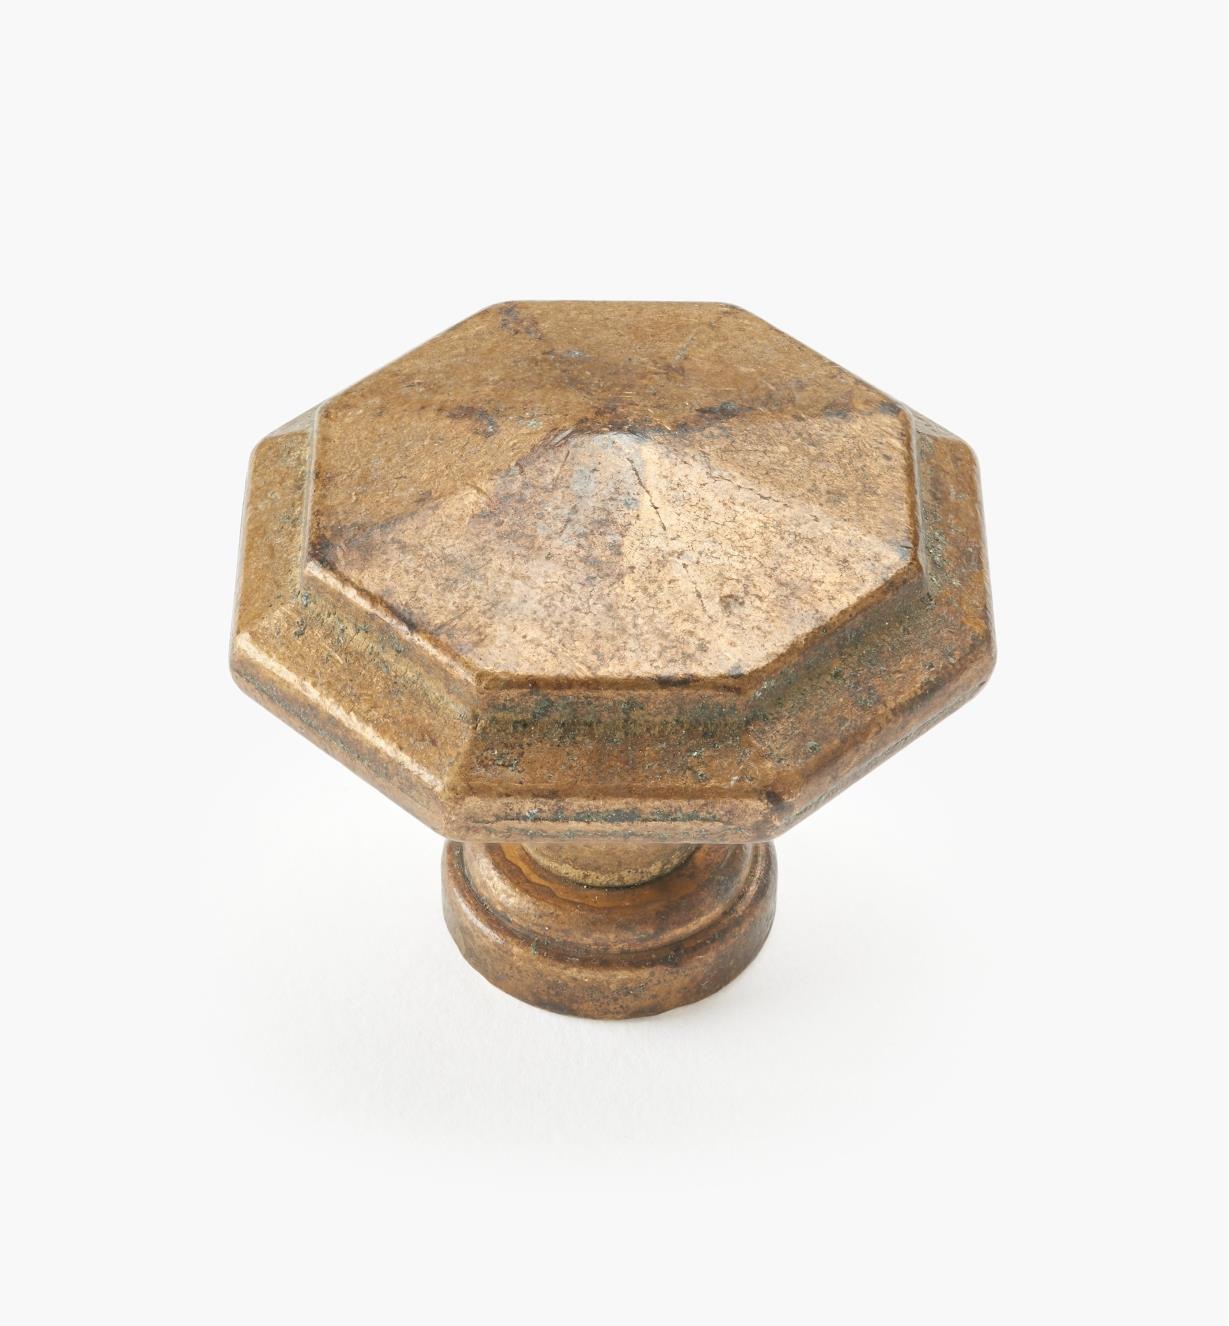 01A7060 - Bouton octogonal, laiton ancien, 38 mm